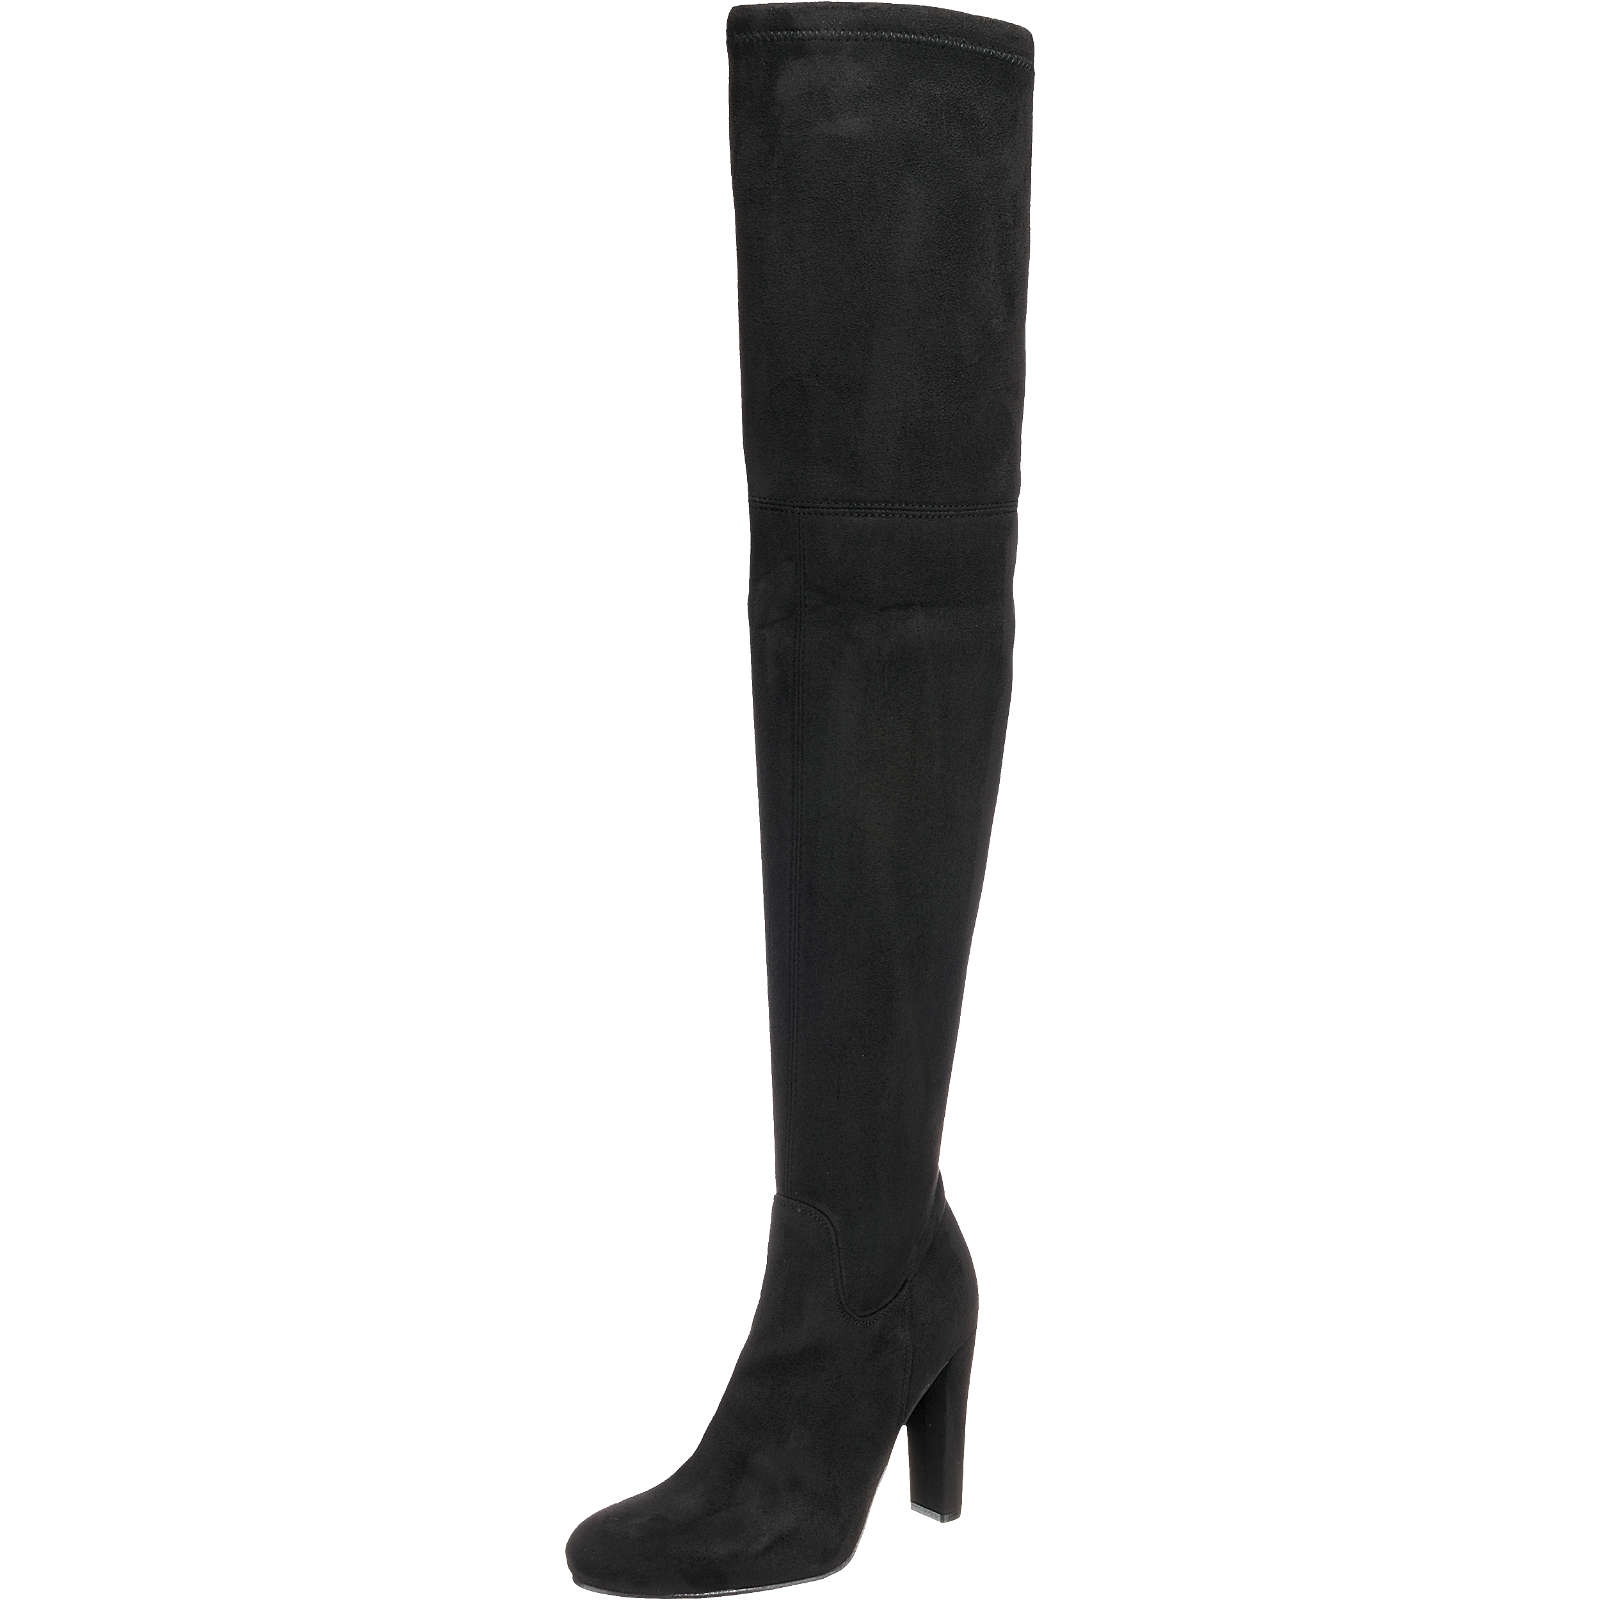 BUFFALO Klassische Stiefel schwarz Damen Gr. 38